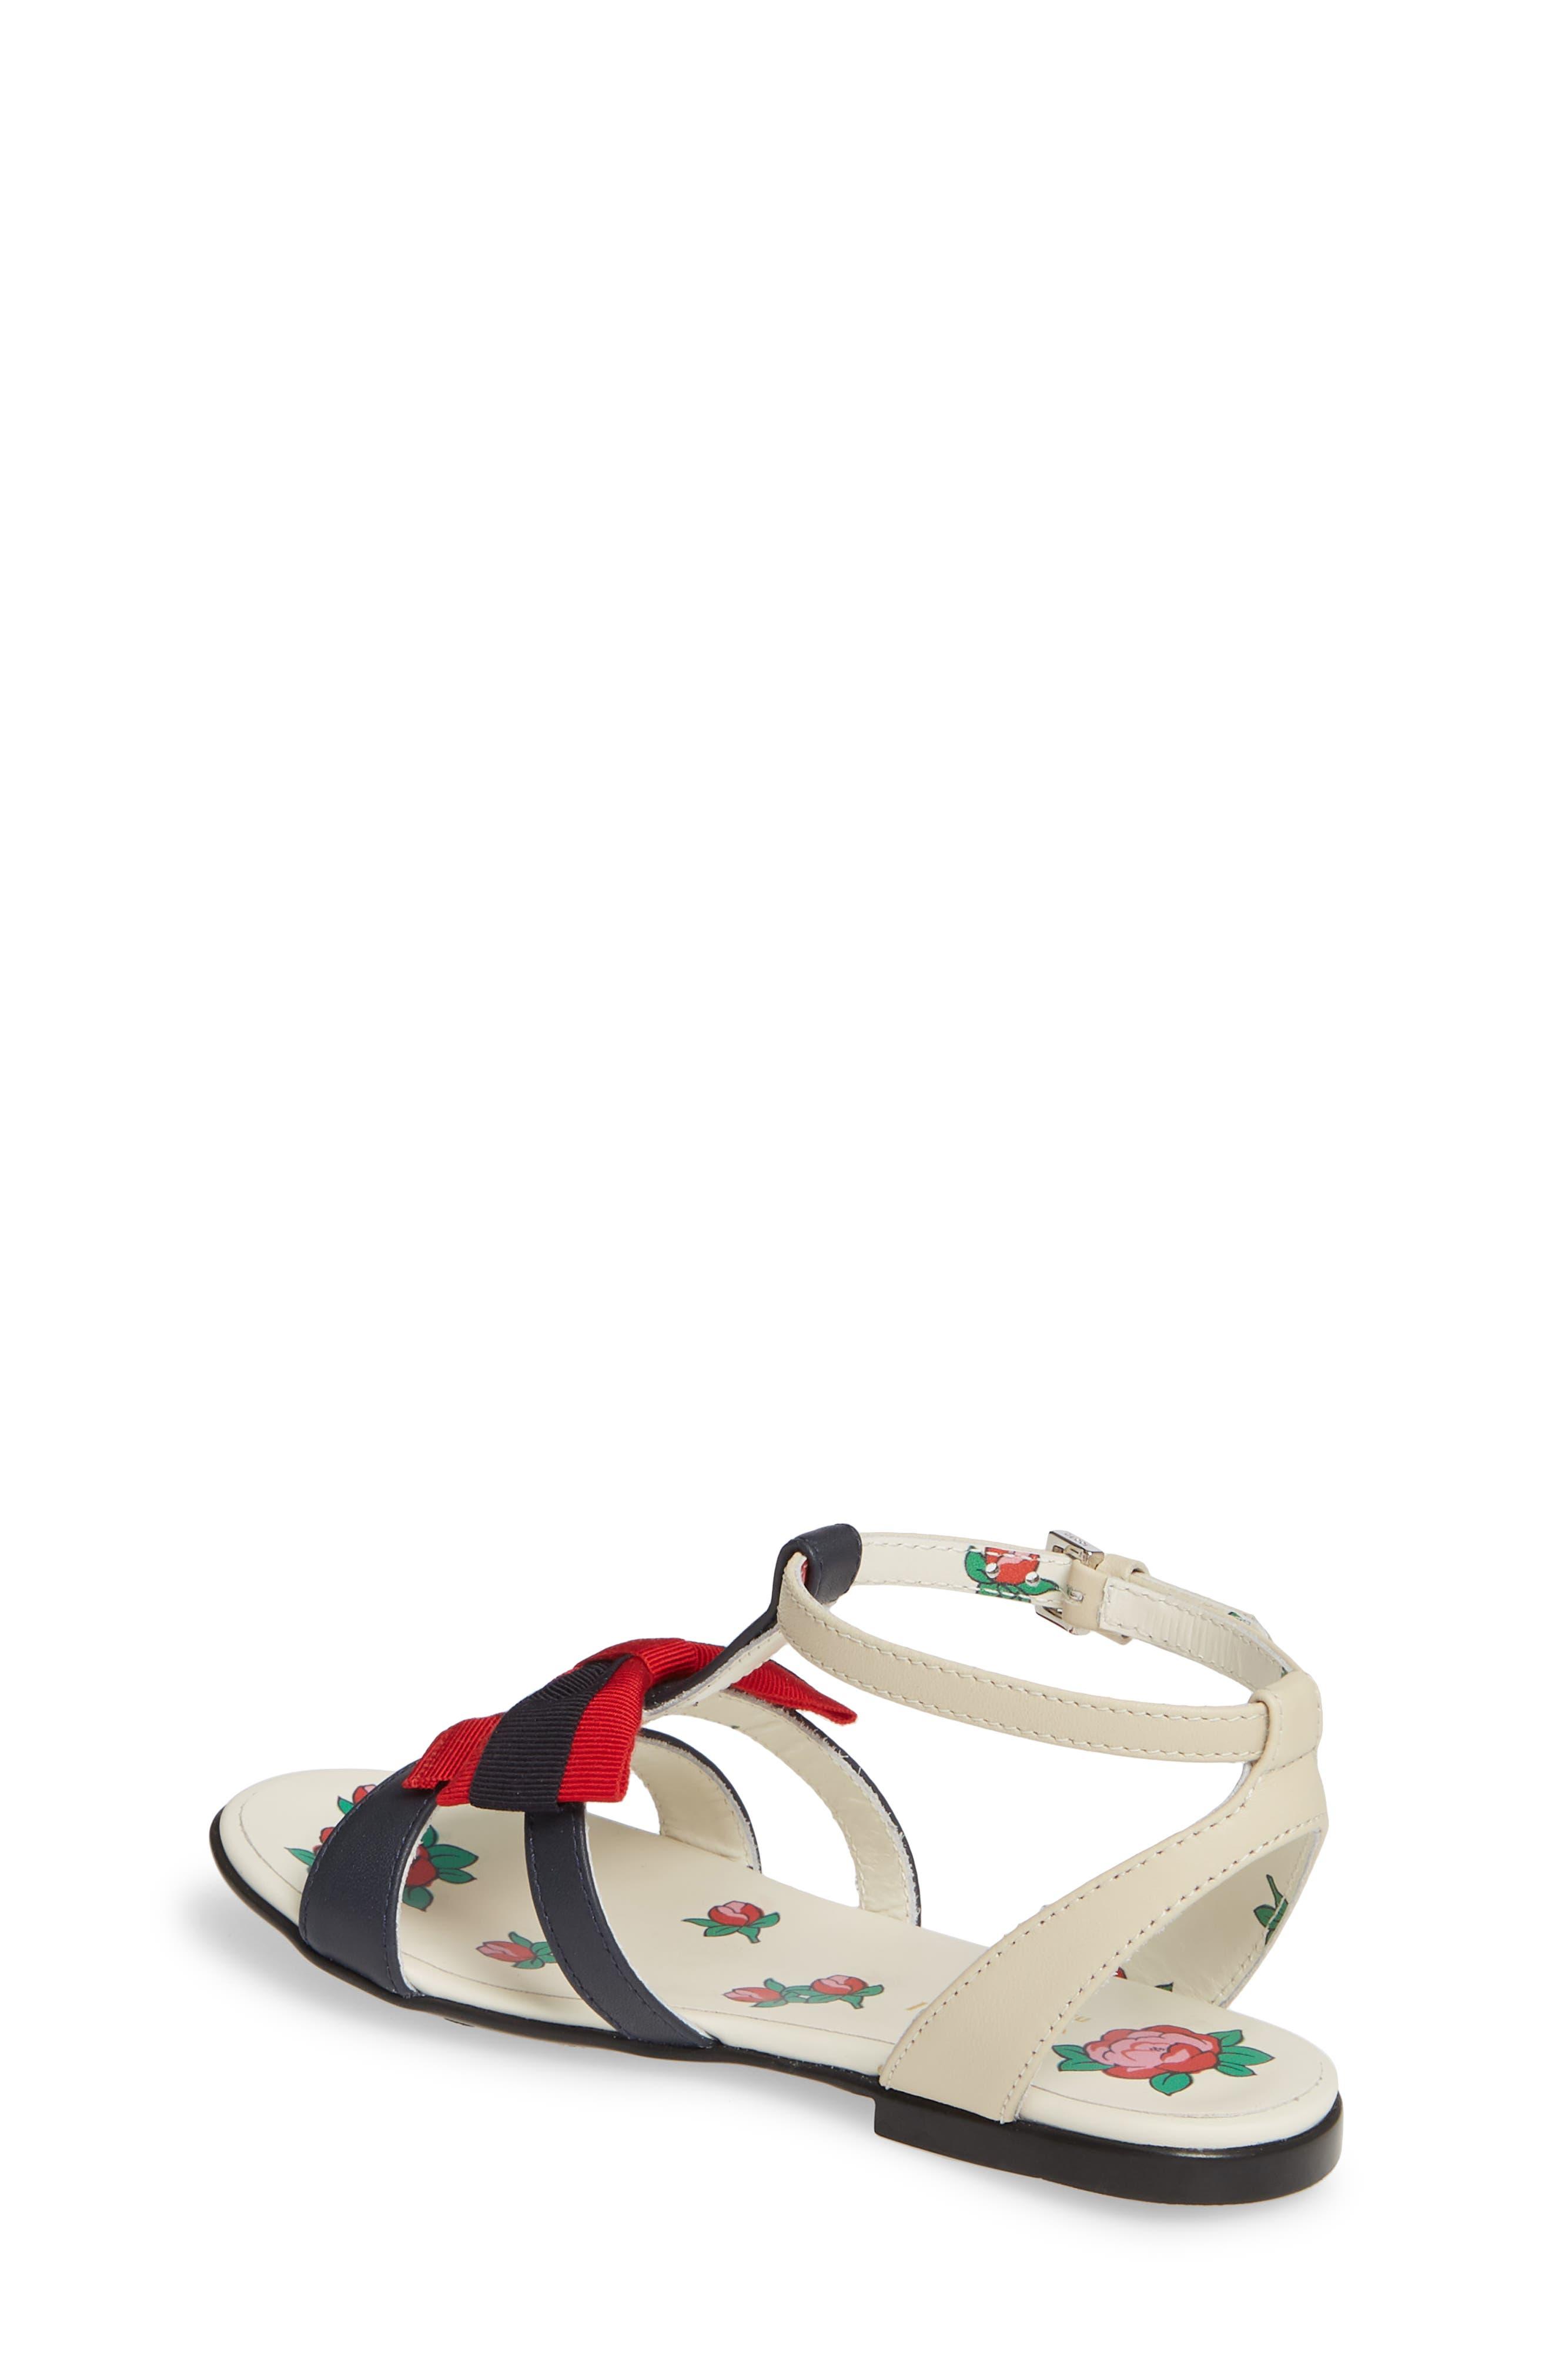 d1682ebb735 Big Boys  Gucci Shoes (Sizes 3.5-7)